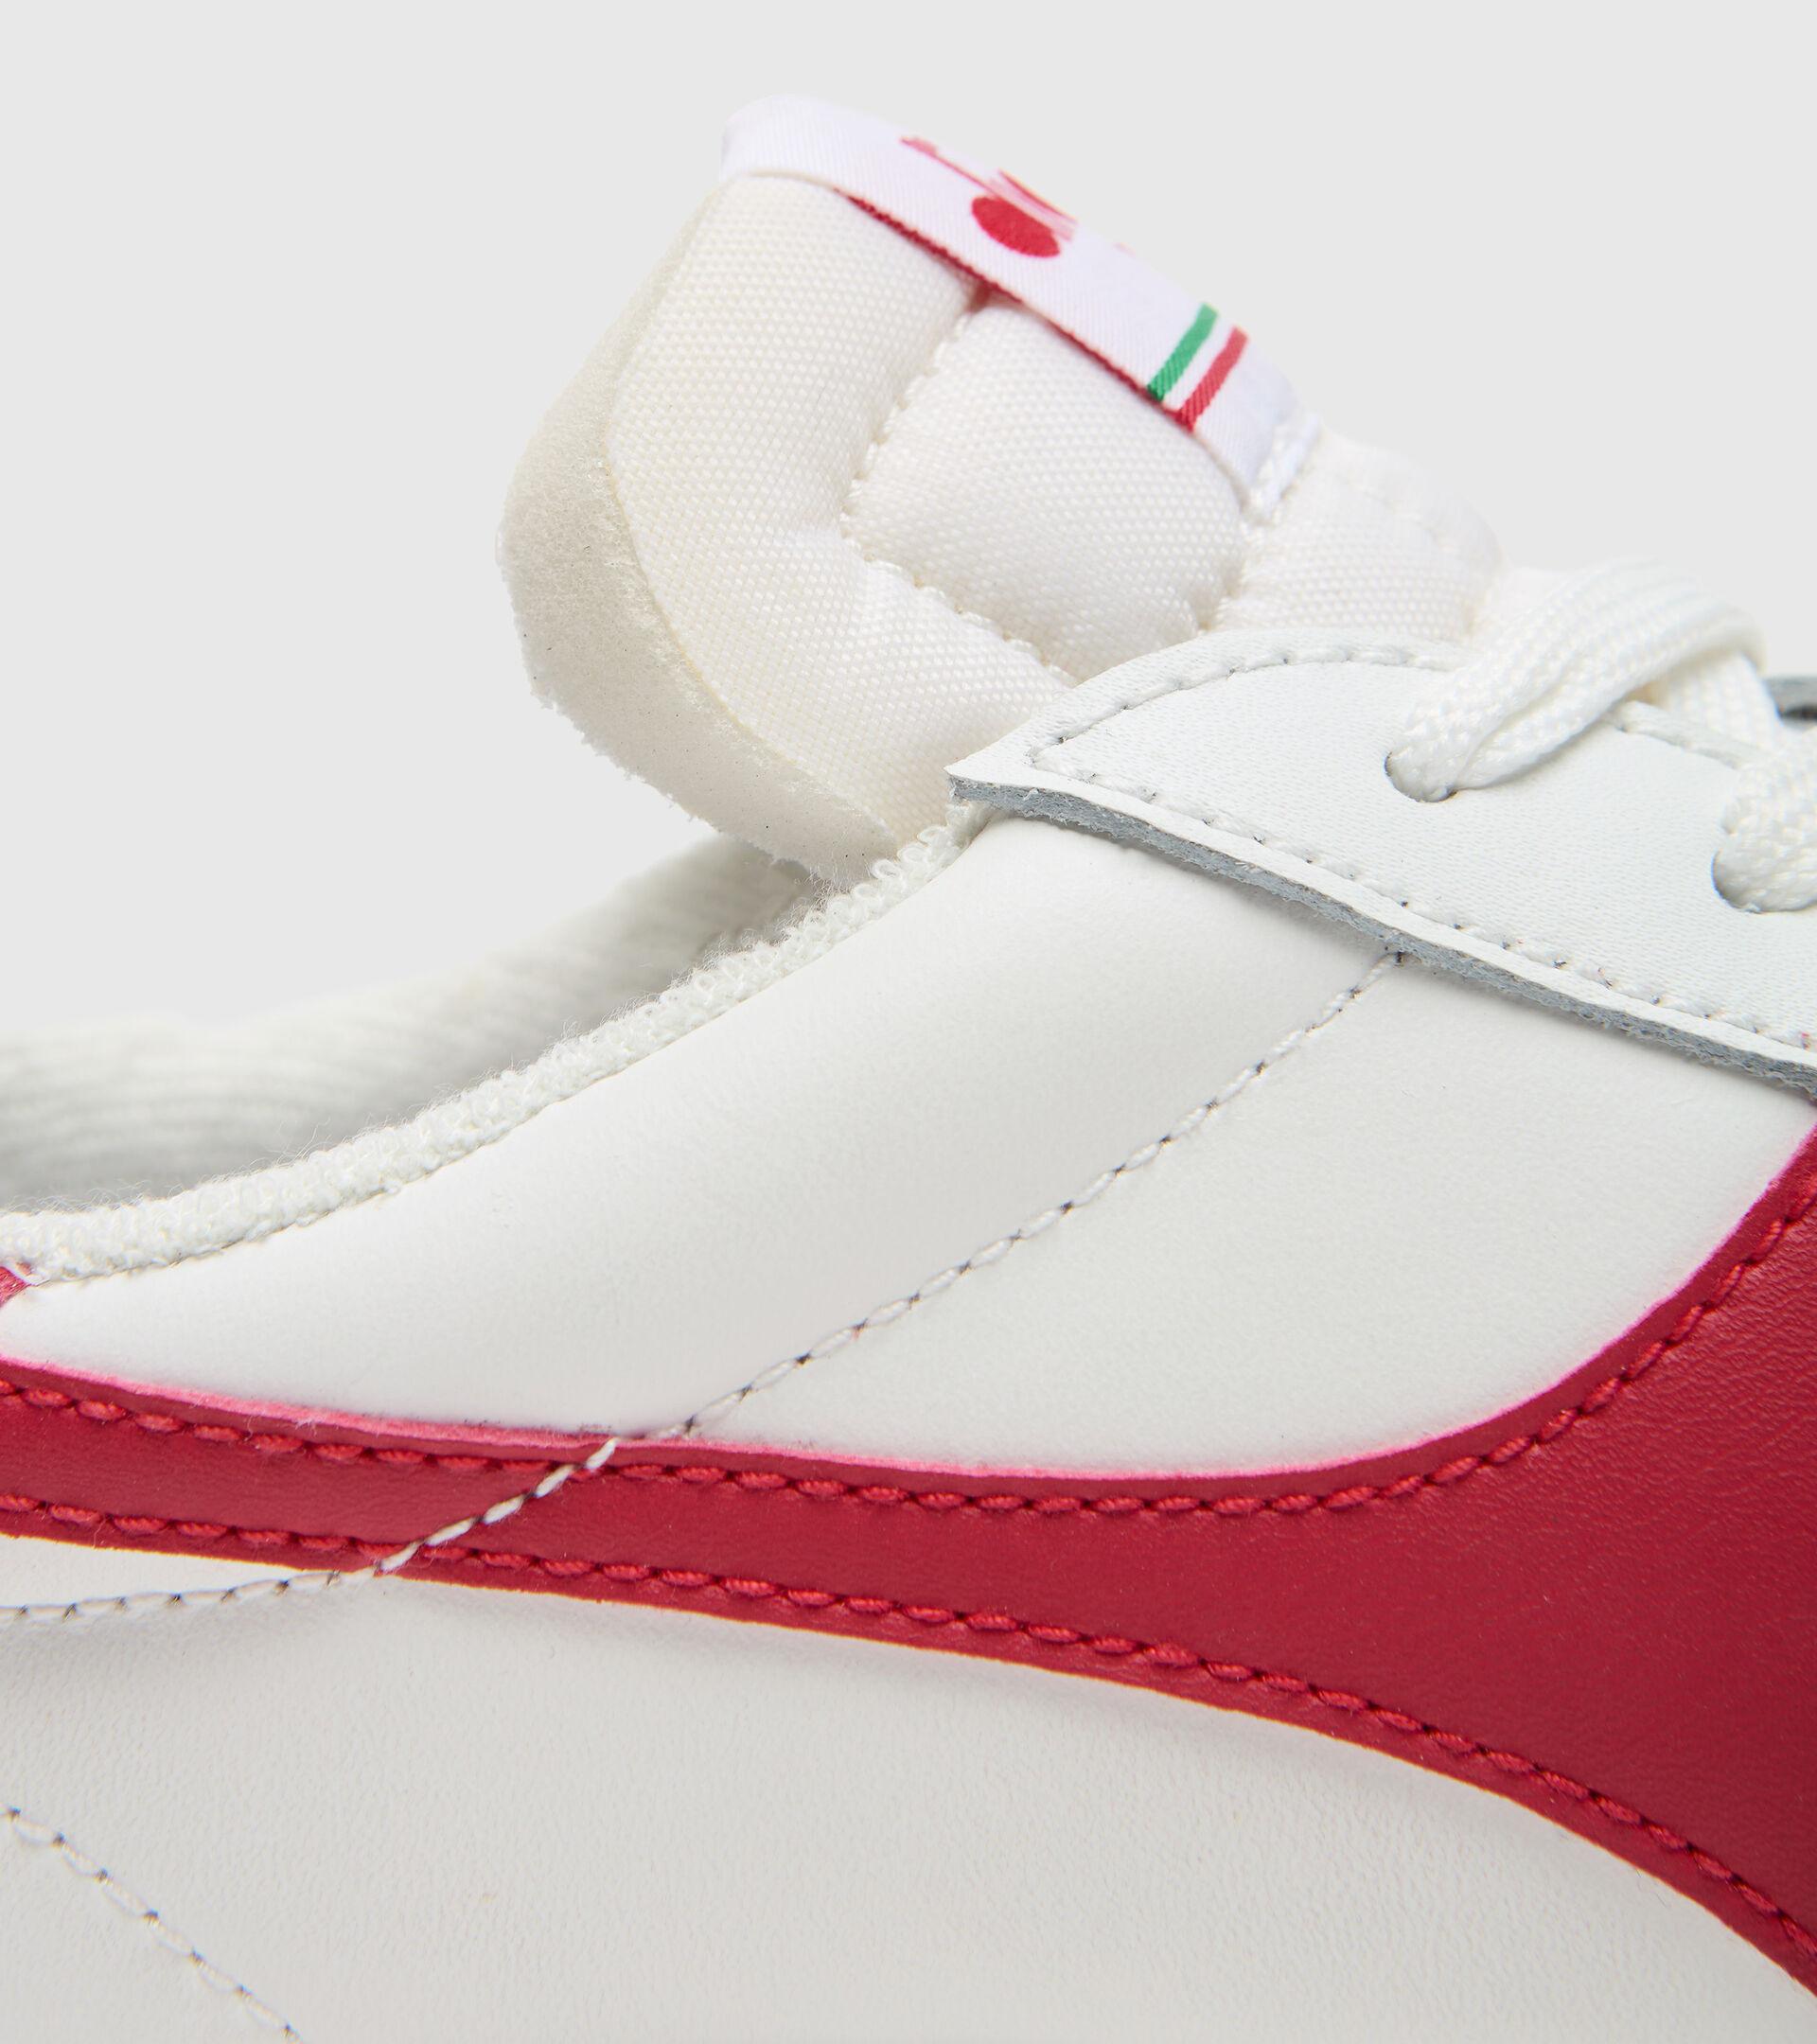 Zapatilla deportiva - Unisex MELODY LEATHER DIRTY BIANCO/ROSSO TANGO - Diadora